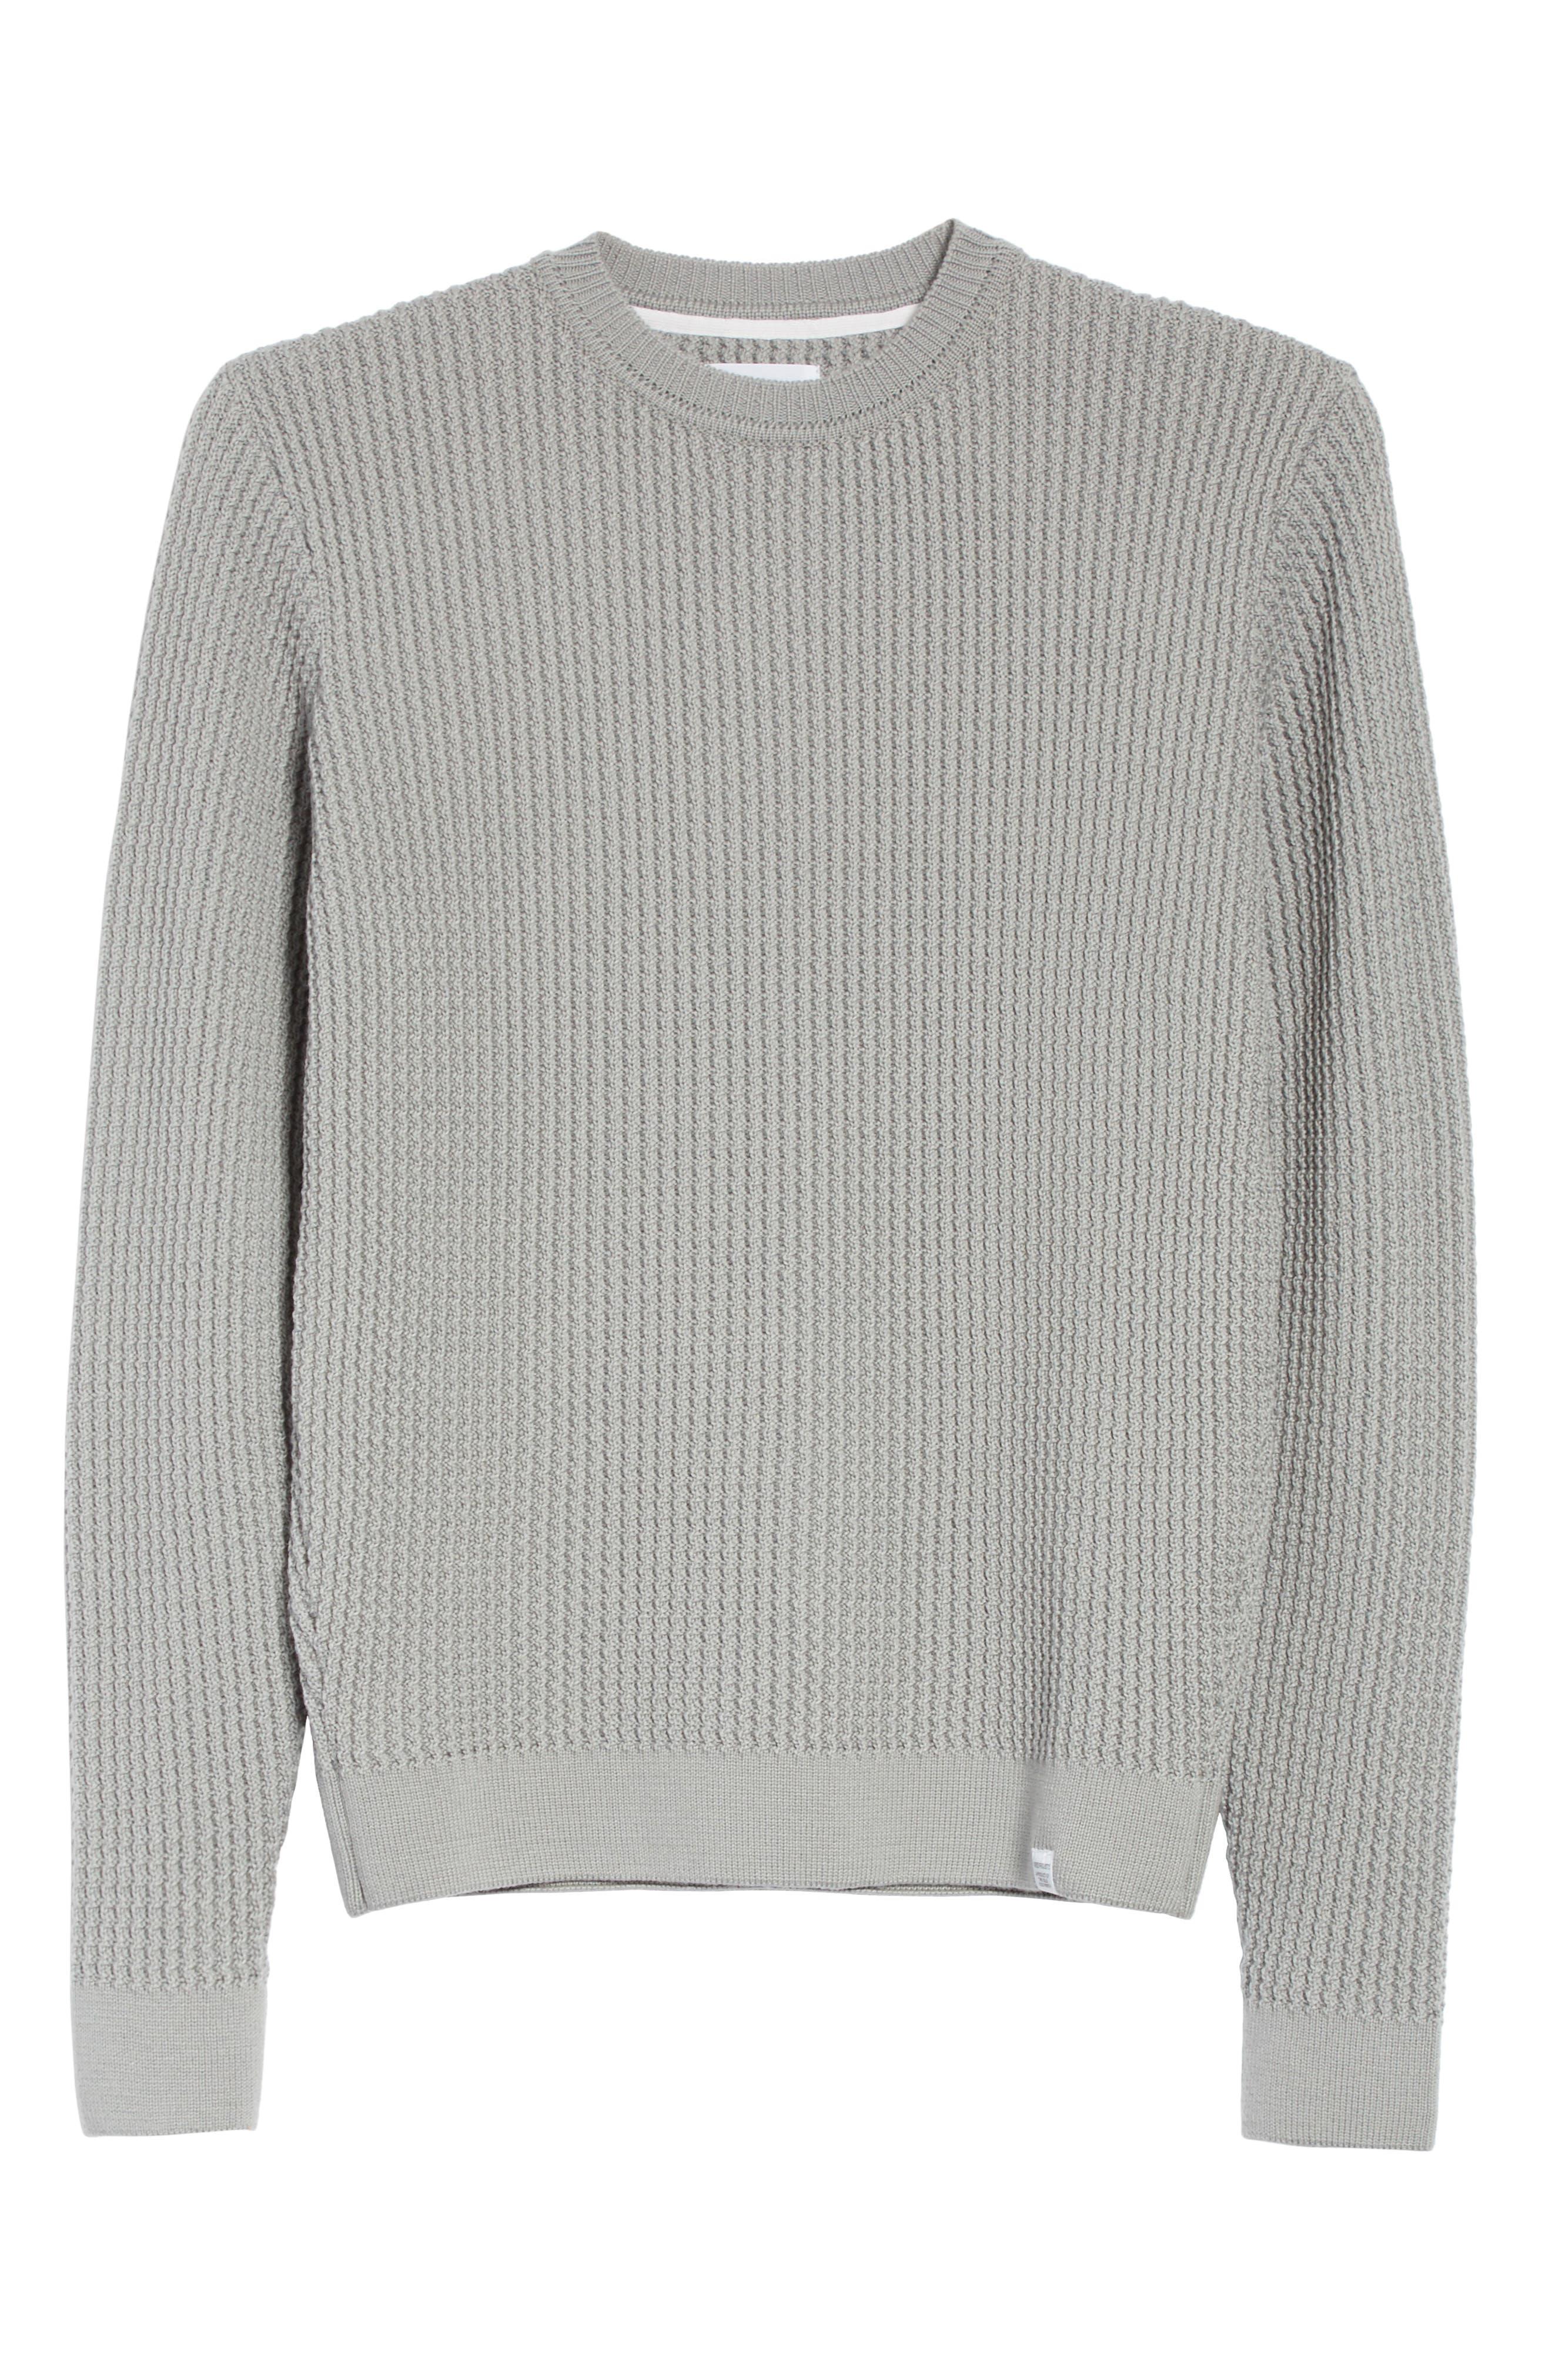 Sigfred Merino Wool Sweater,                             Alternate thumbnail 6, color,                             025